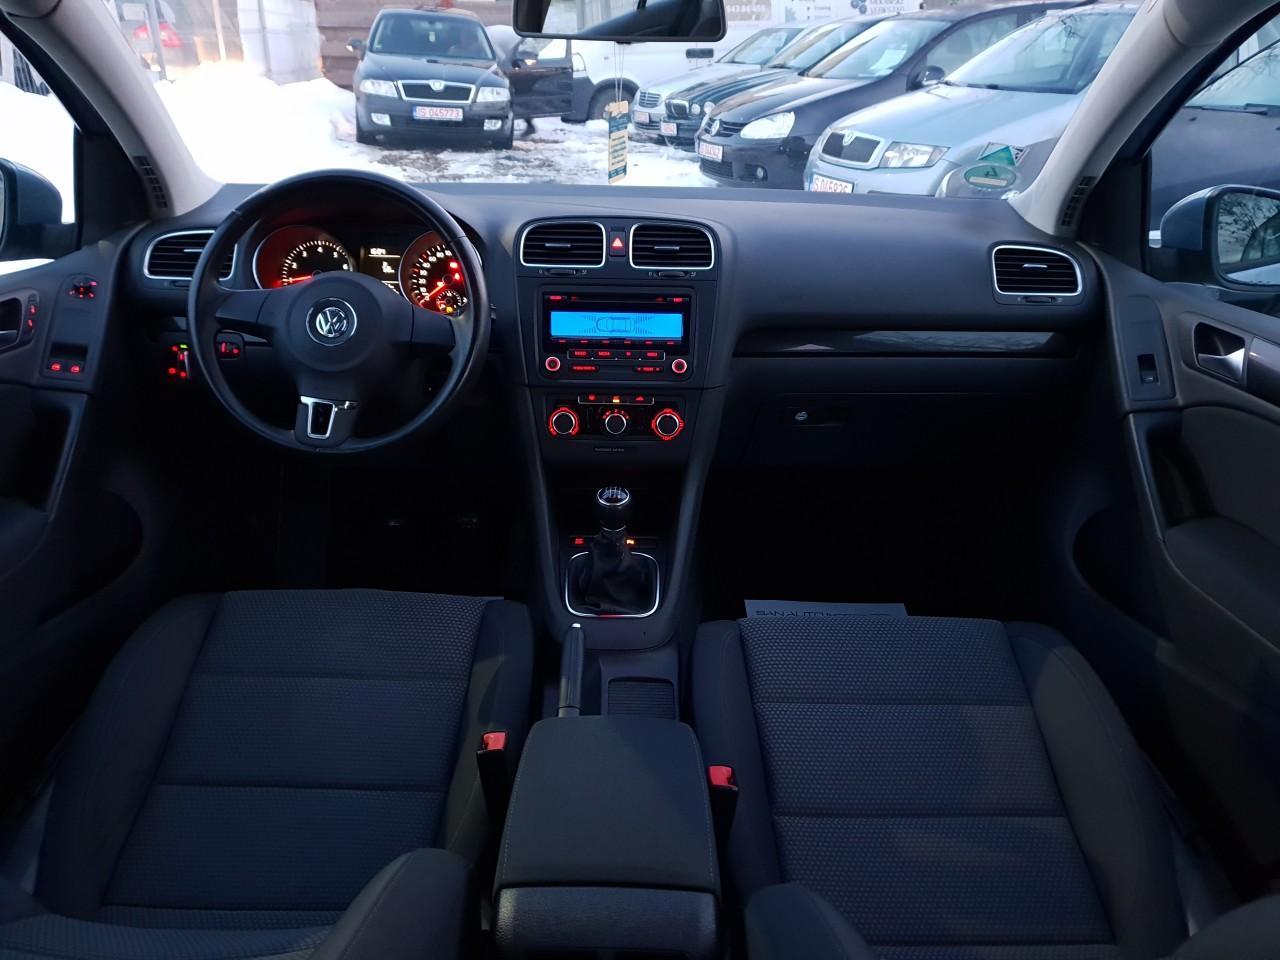 VW Golf 1,4 TSI 2009